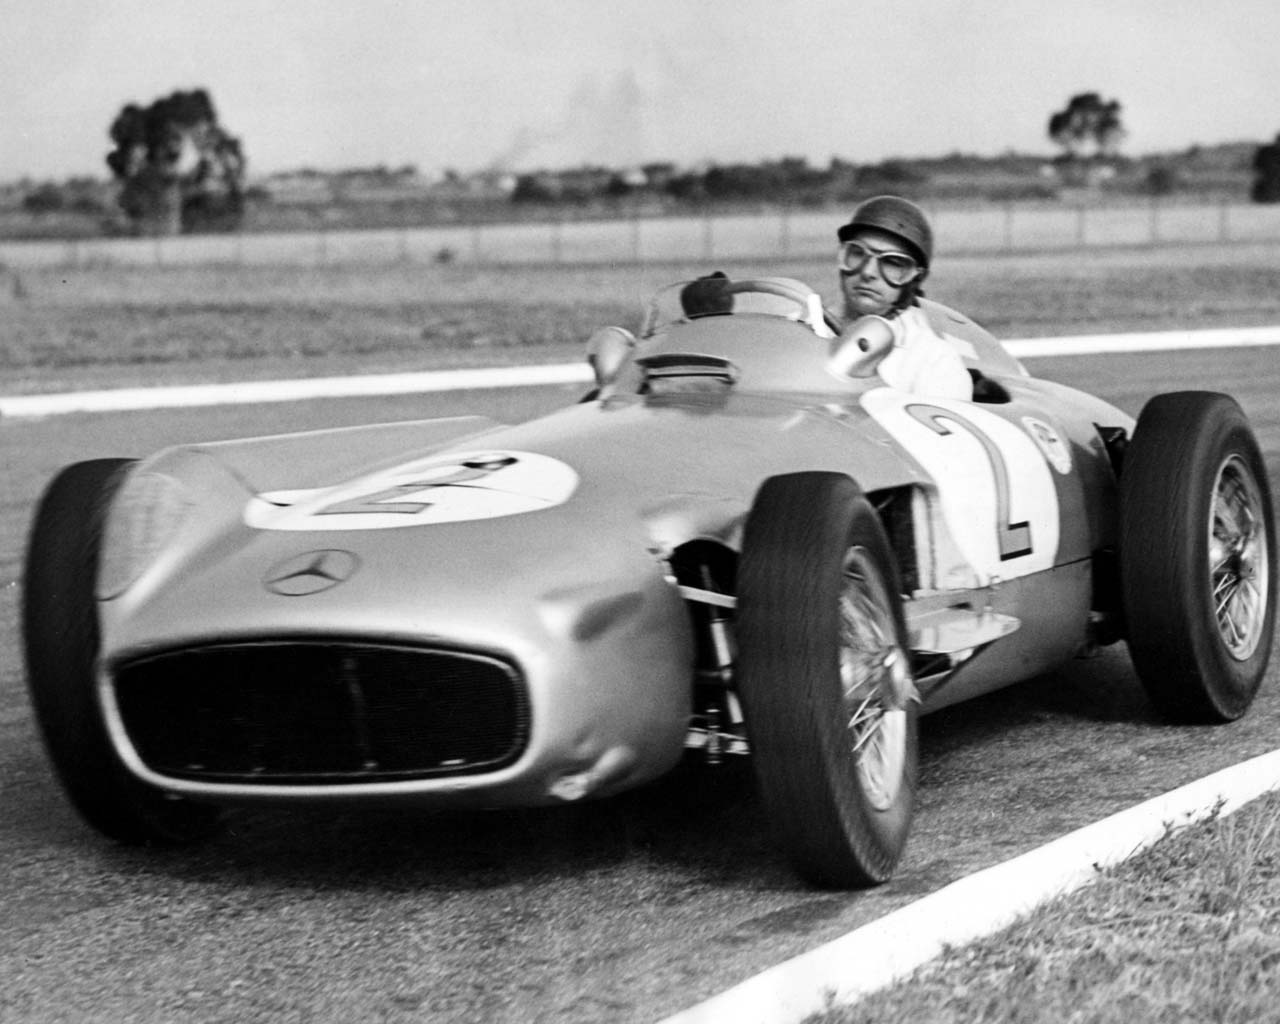 Día del Piloto, en honor a Juan Manuel Fangio